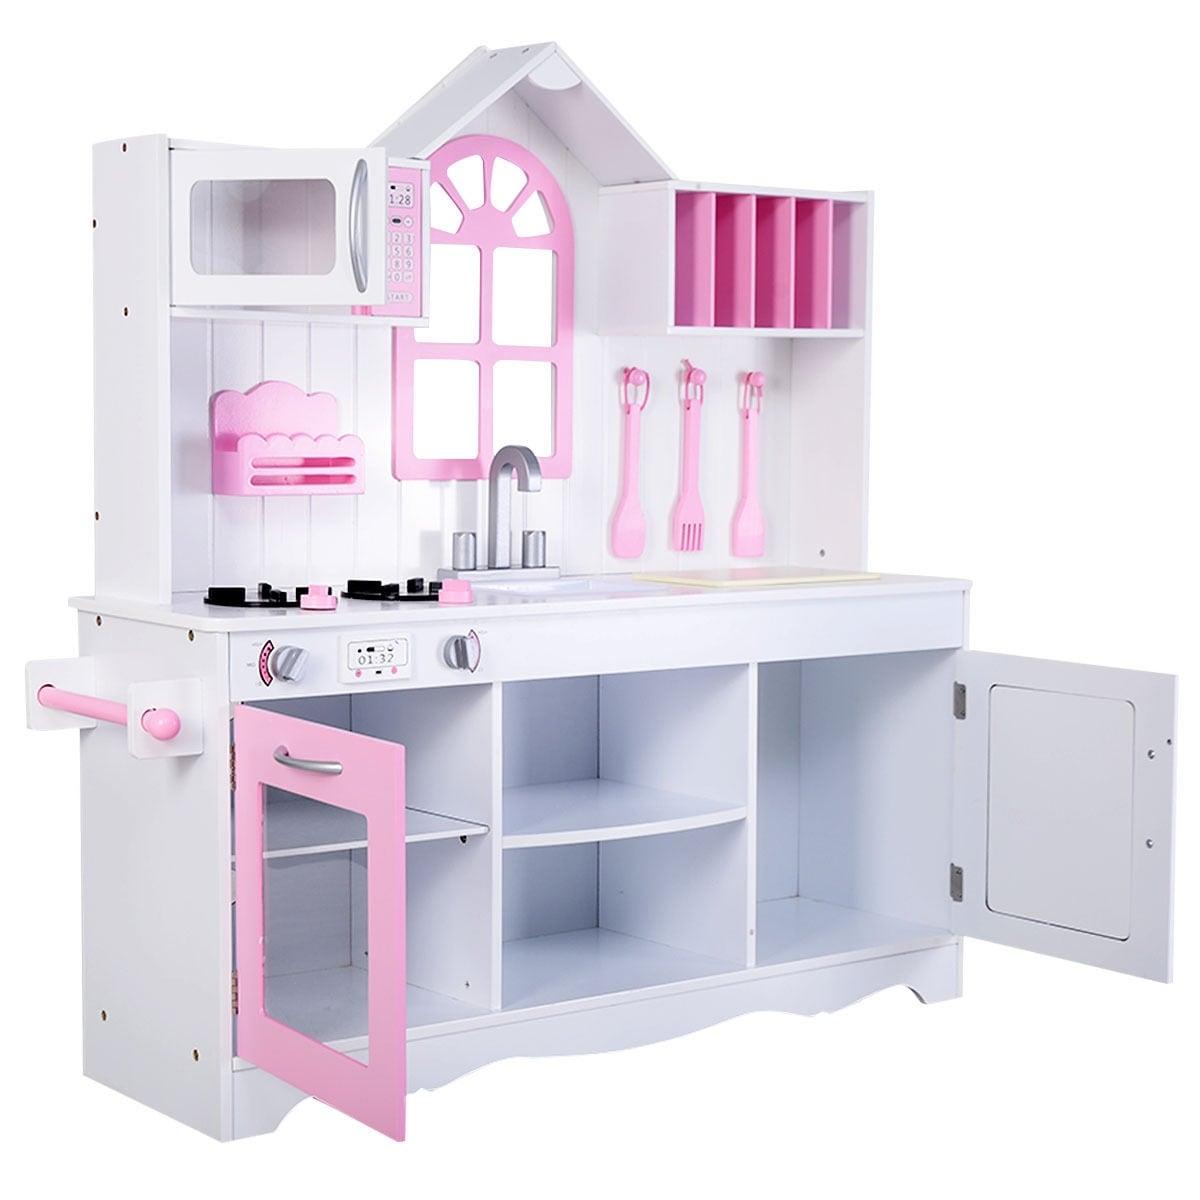 Costway Kids Wood Kitchen Toy Cooking Pretend Play Set Toddler ...